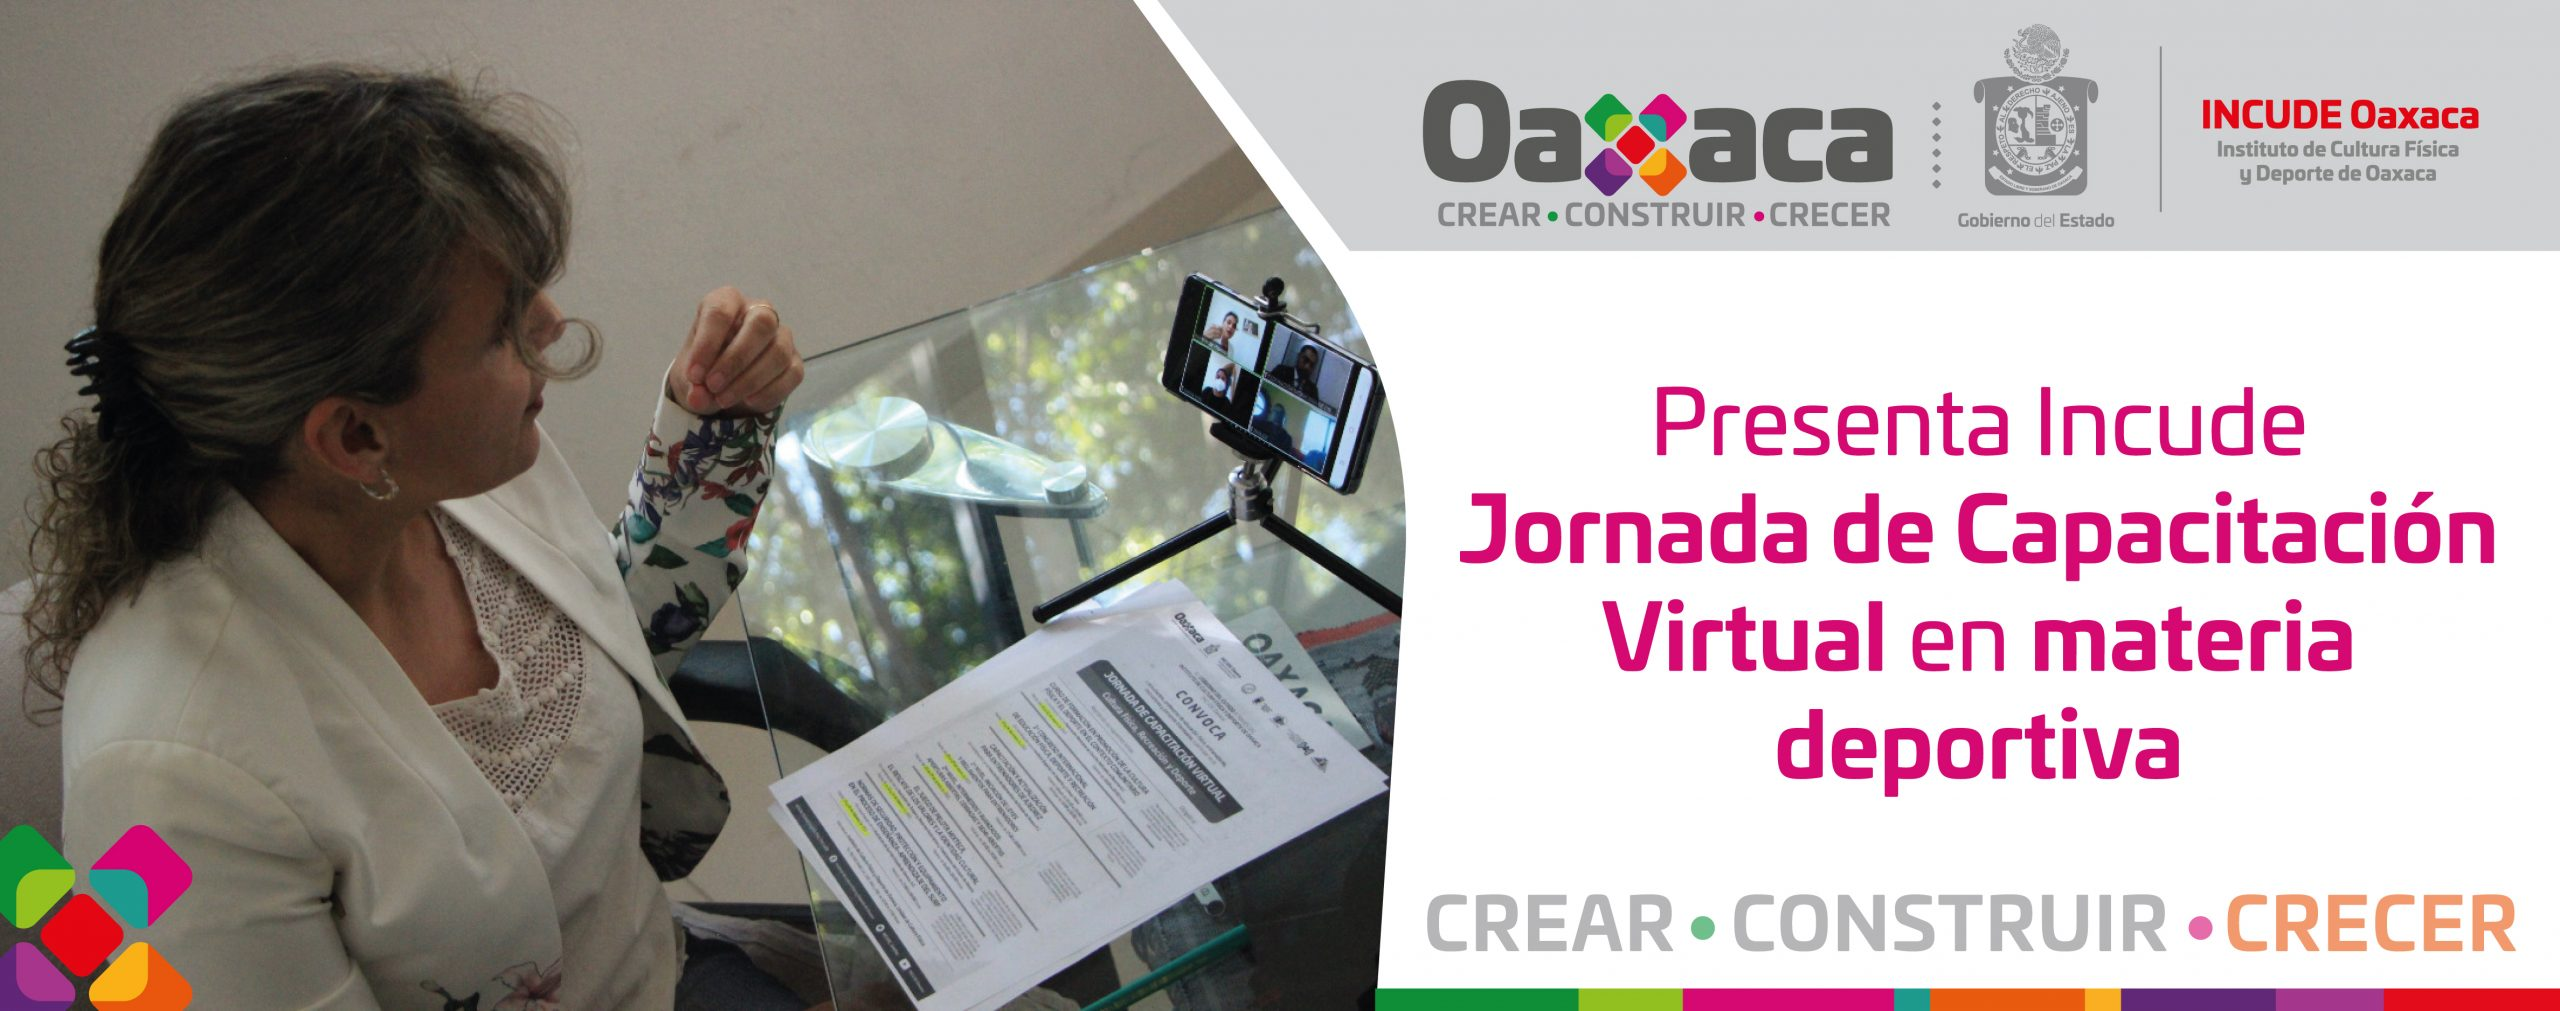 Presenta Incude Jornada de Capacitación Virtual en materia deportiva